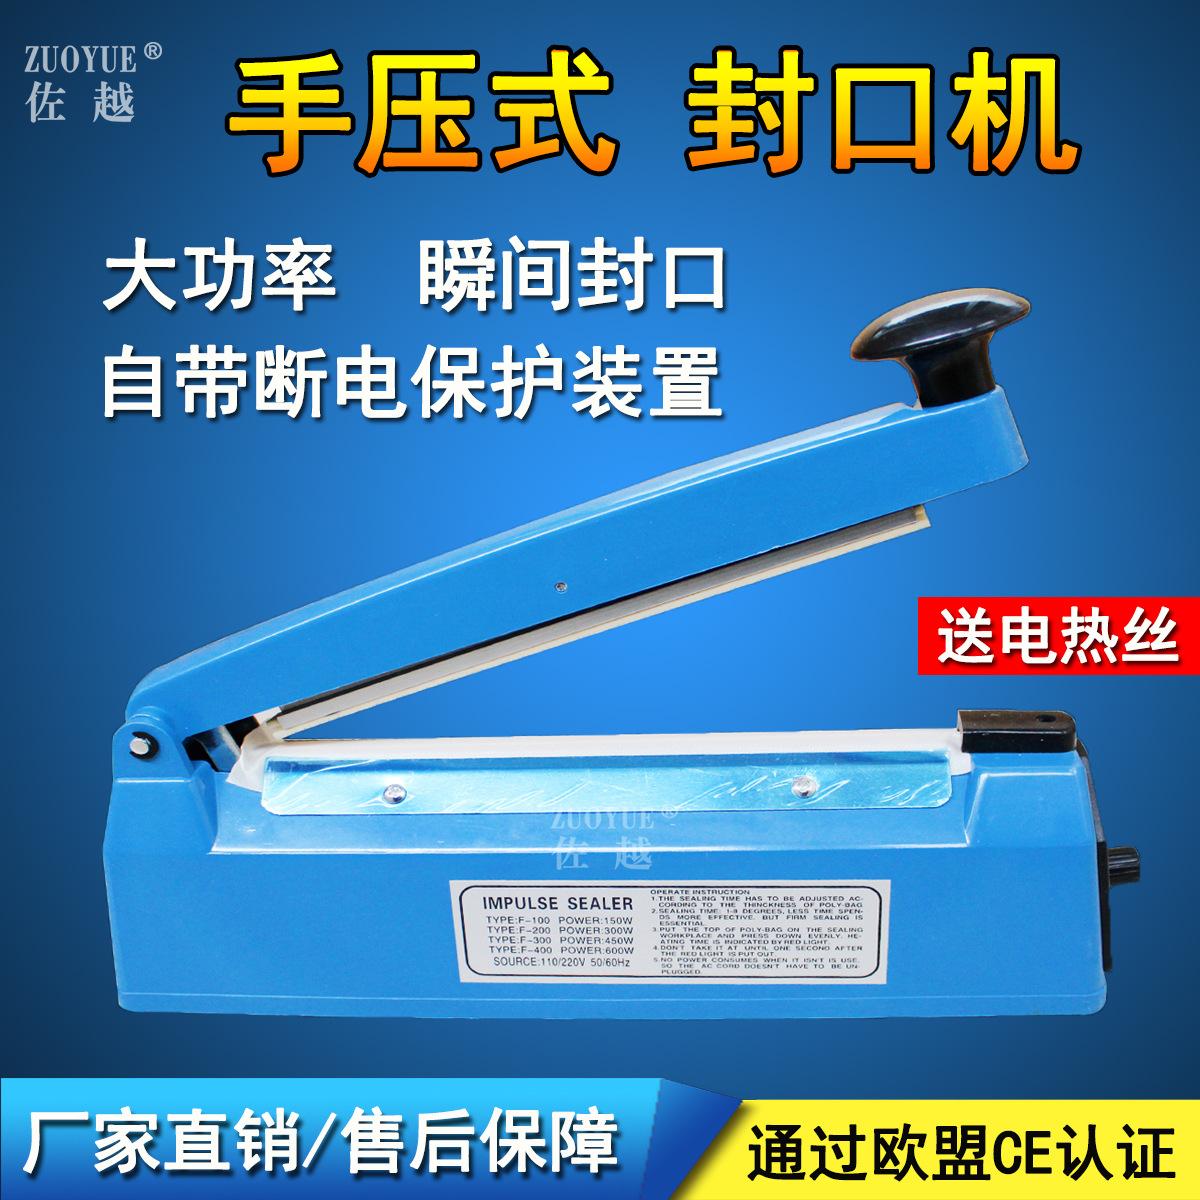 PFS-300手压式封口机 手动封口机 塑料袋封口机 手提式胶袋封口机